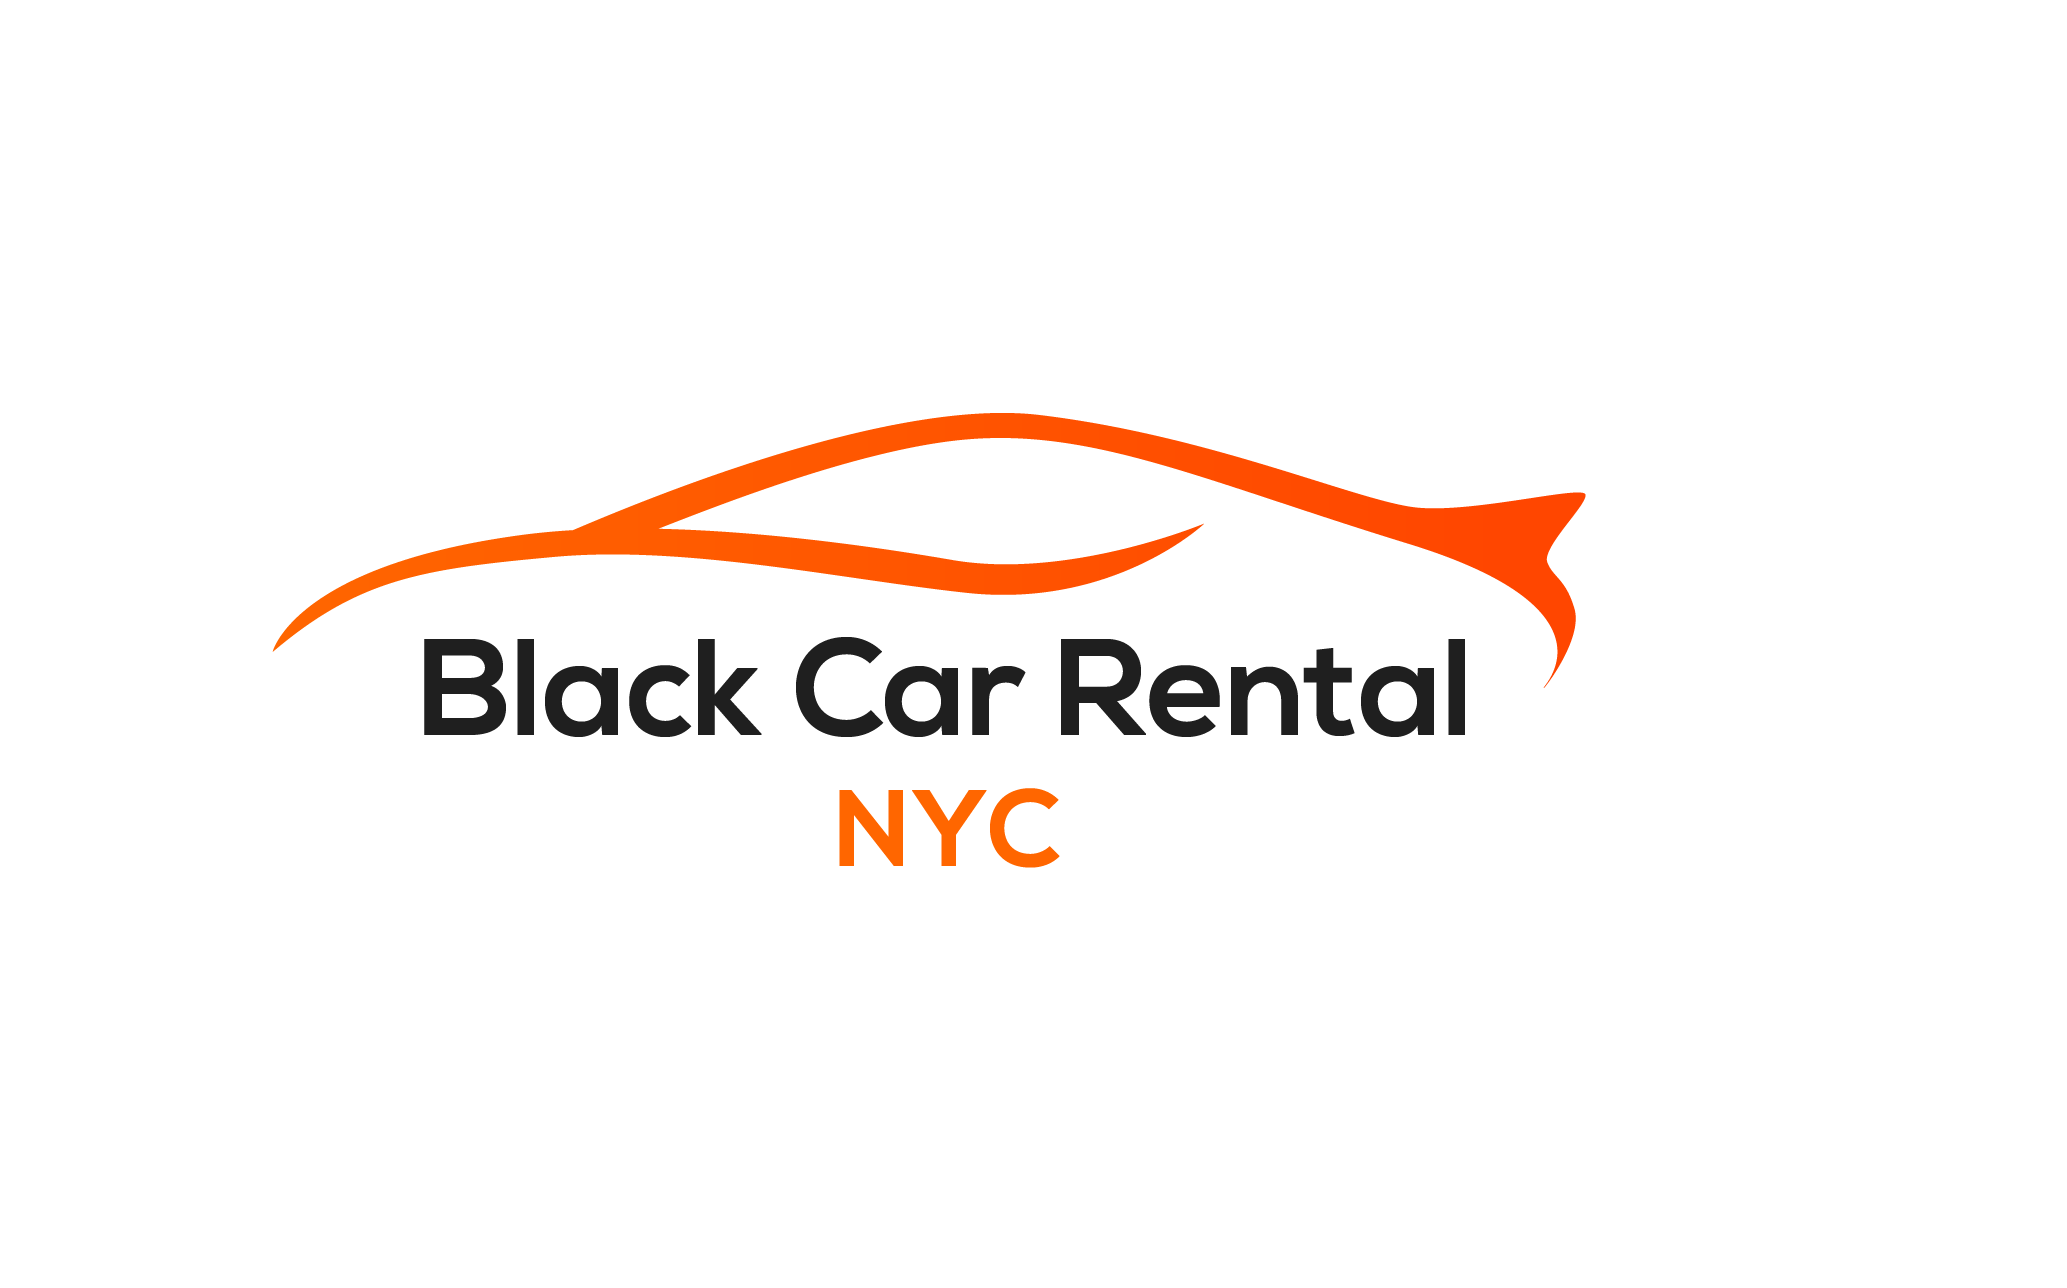 BlackCarRentalNYC